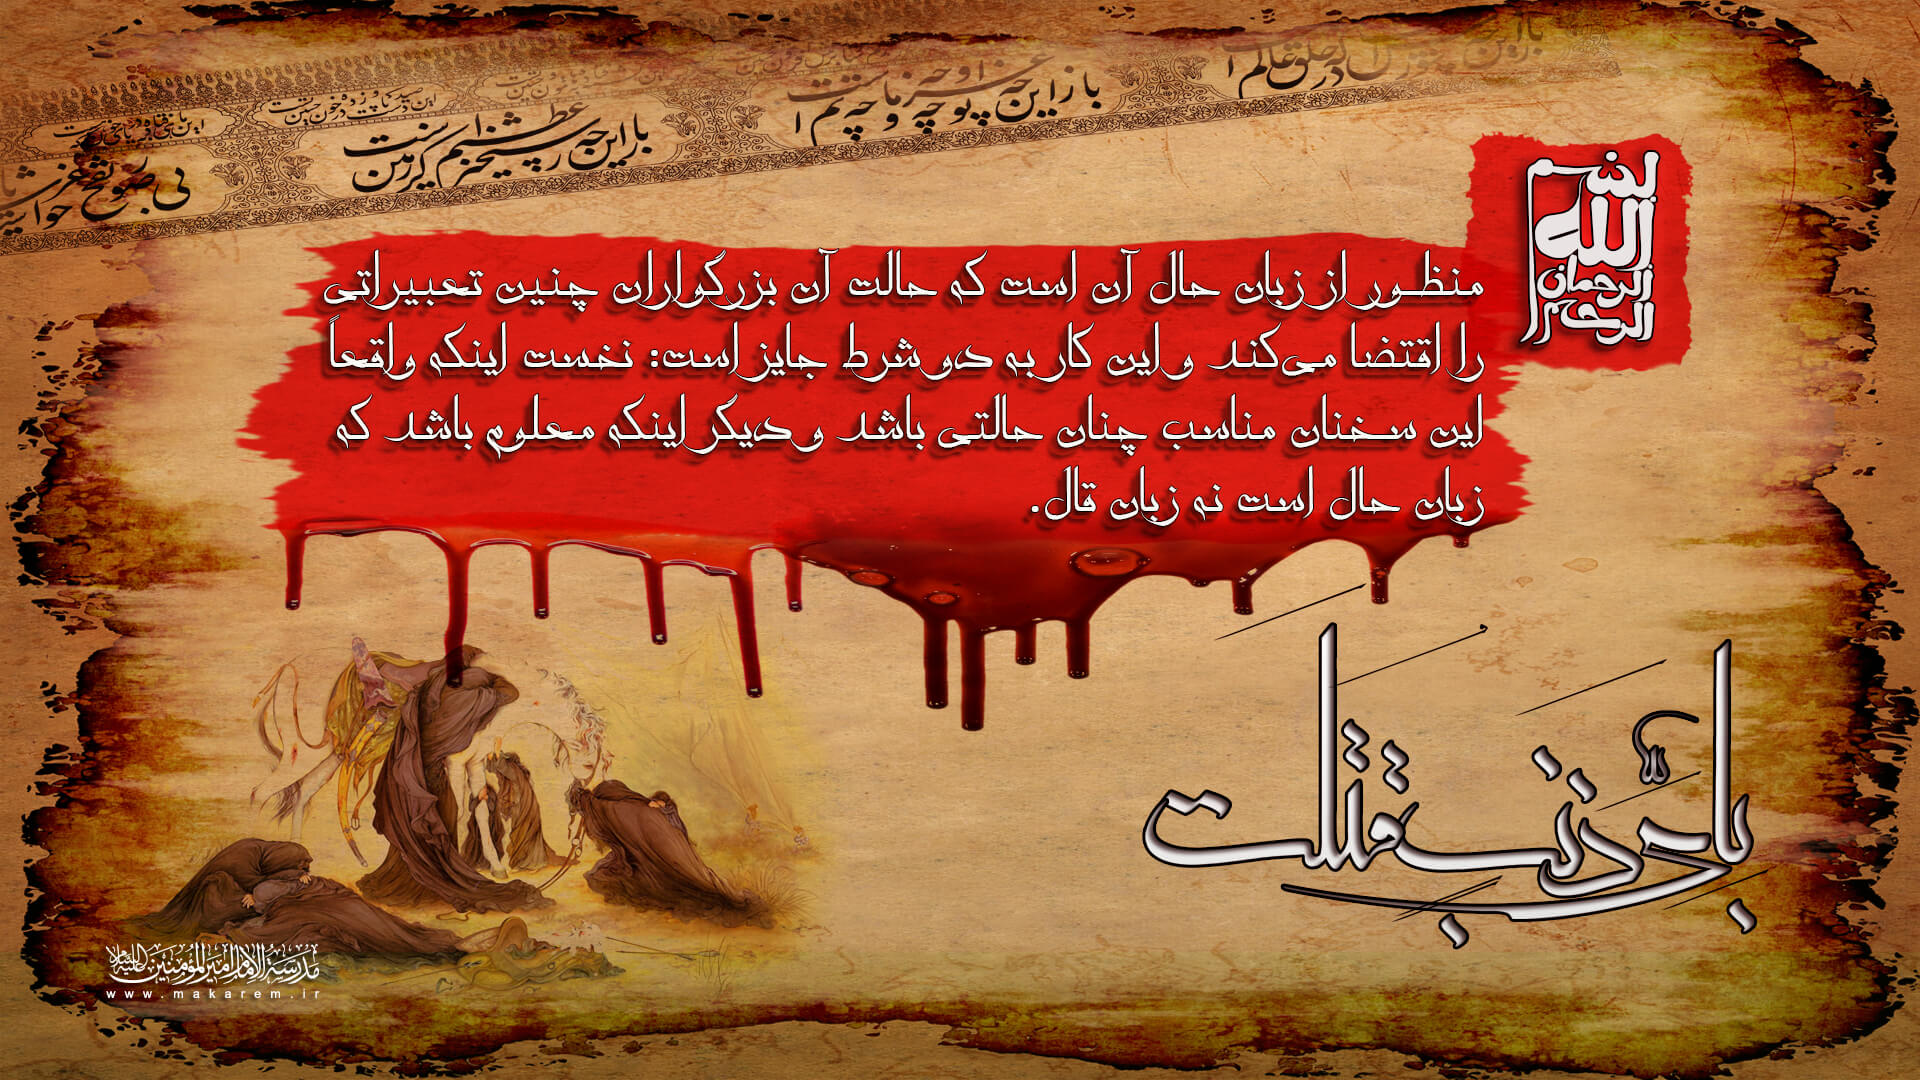 احکام عزاداری 04-مدرسه الامام امیر المومنین (ع)